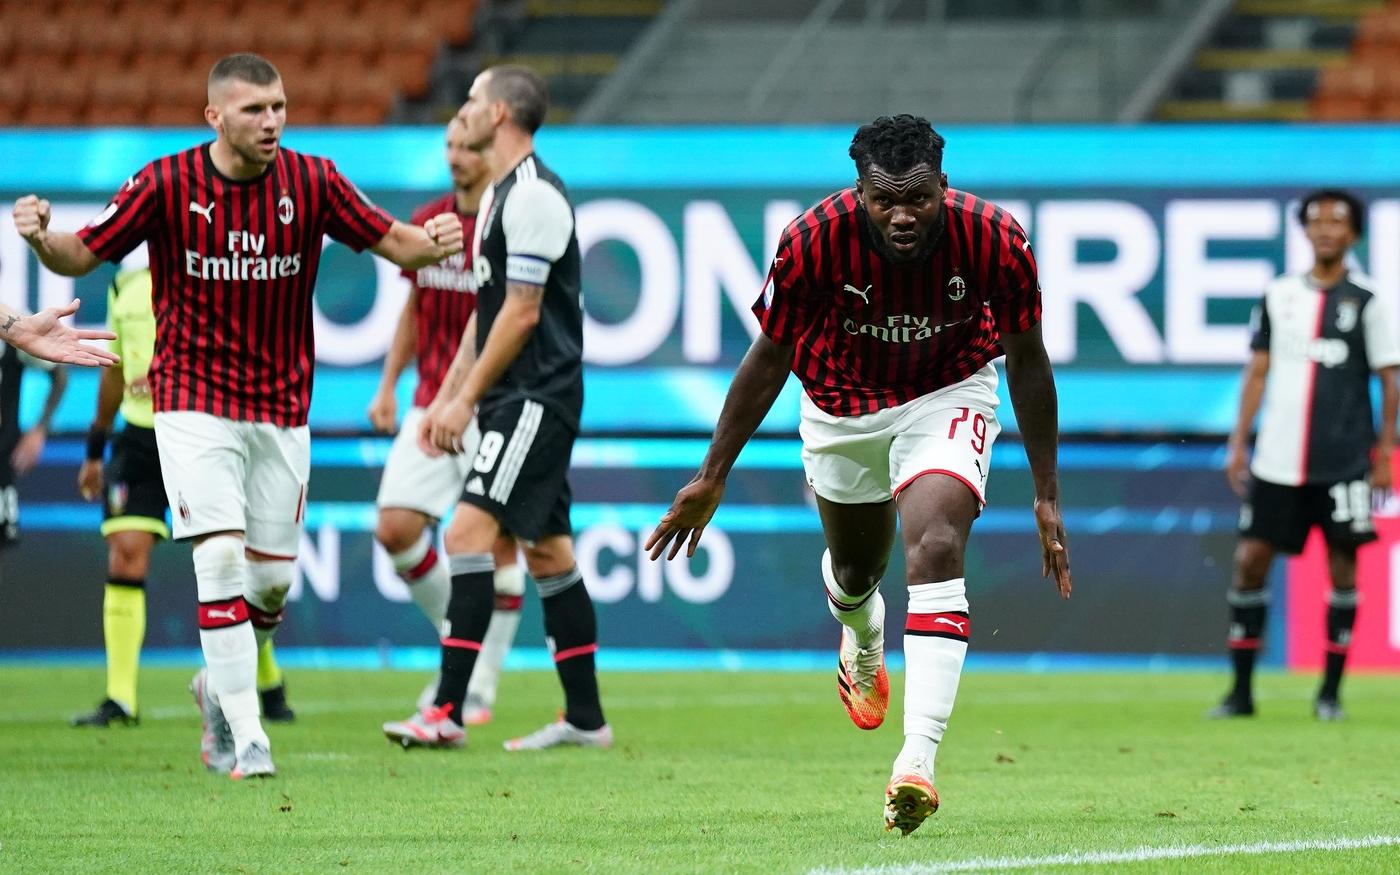 Pagelle Milan-Juventus 4-2, voti Serie A: Ibrahimovic, Kessie, Rebic e Leao  ribaltano i bianconeri – OA Sport